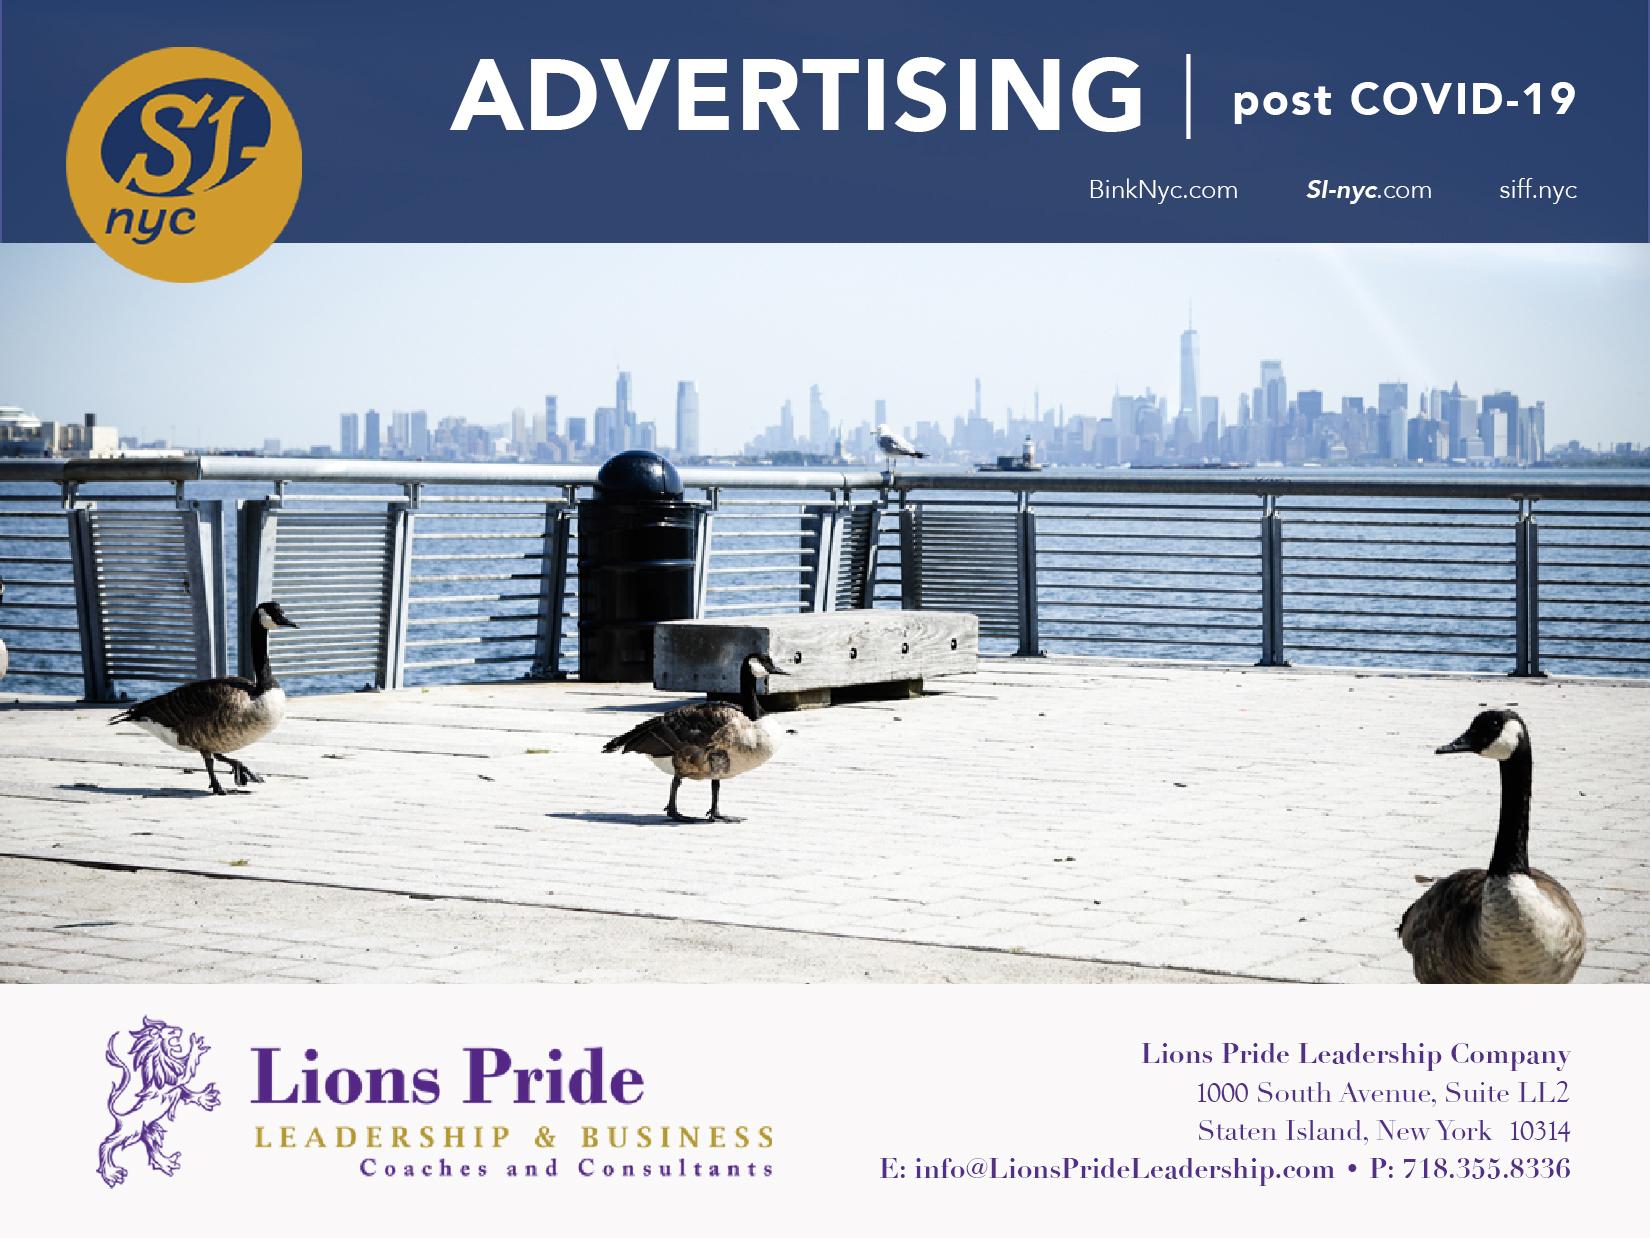 LPL SI-nyc Ad Present 01